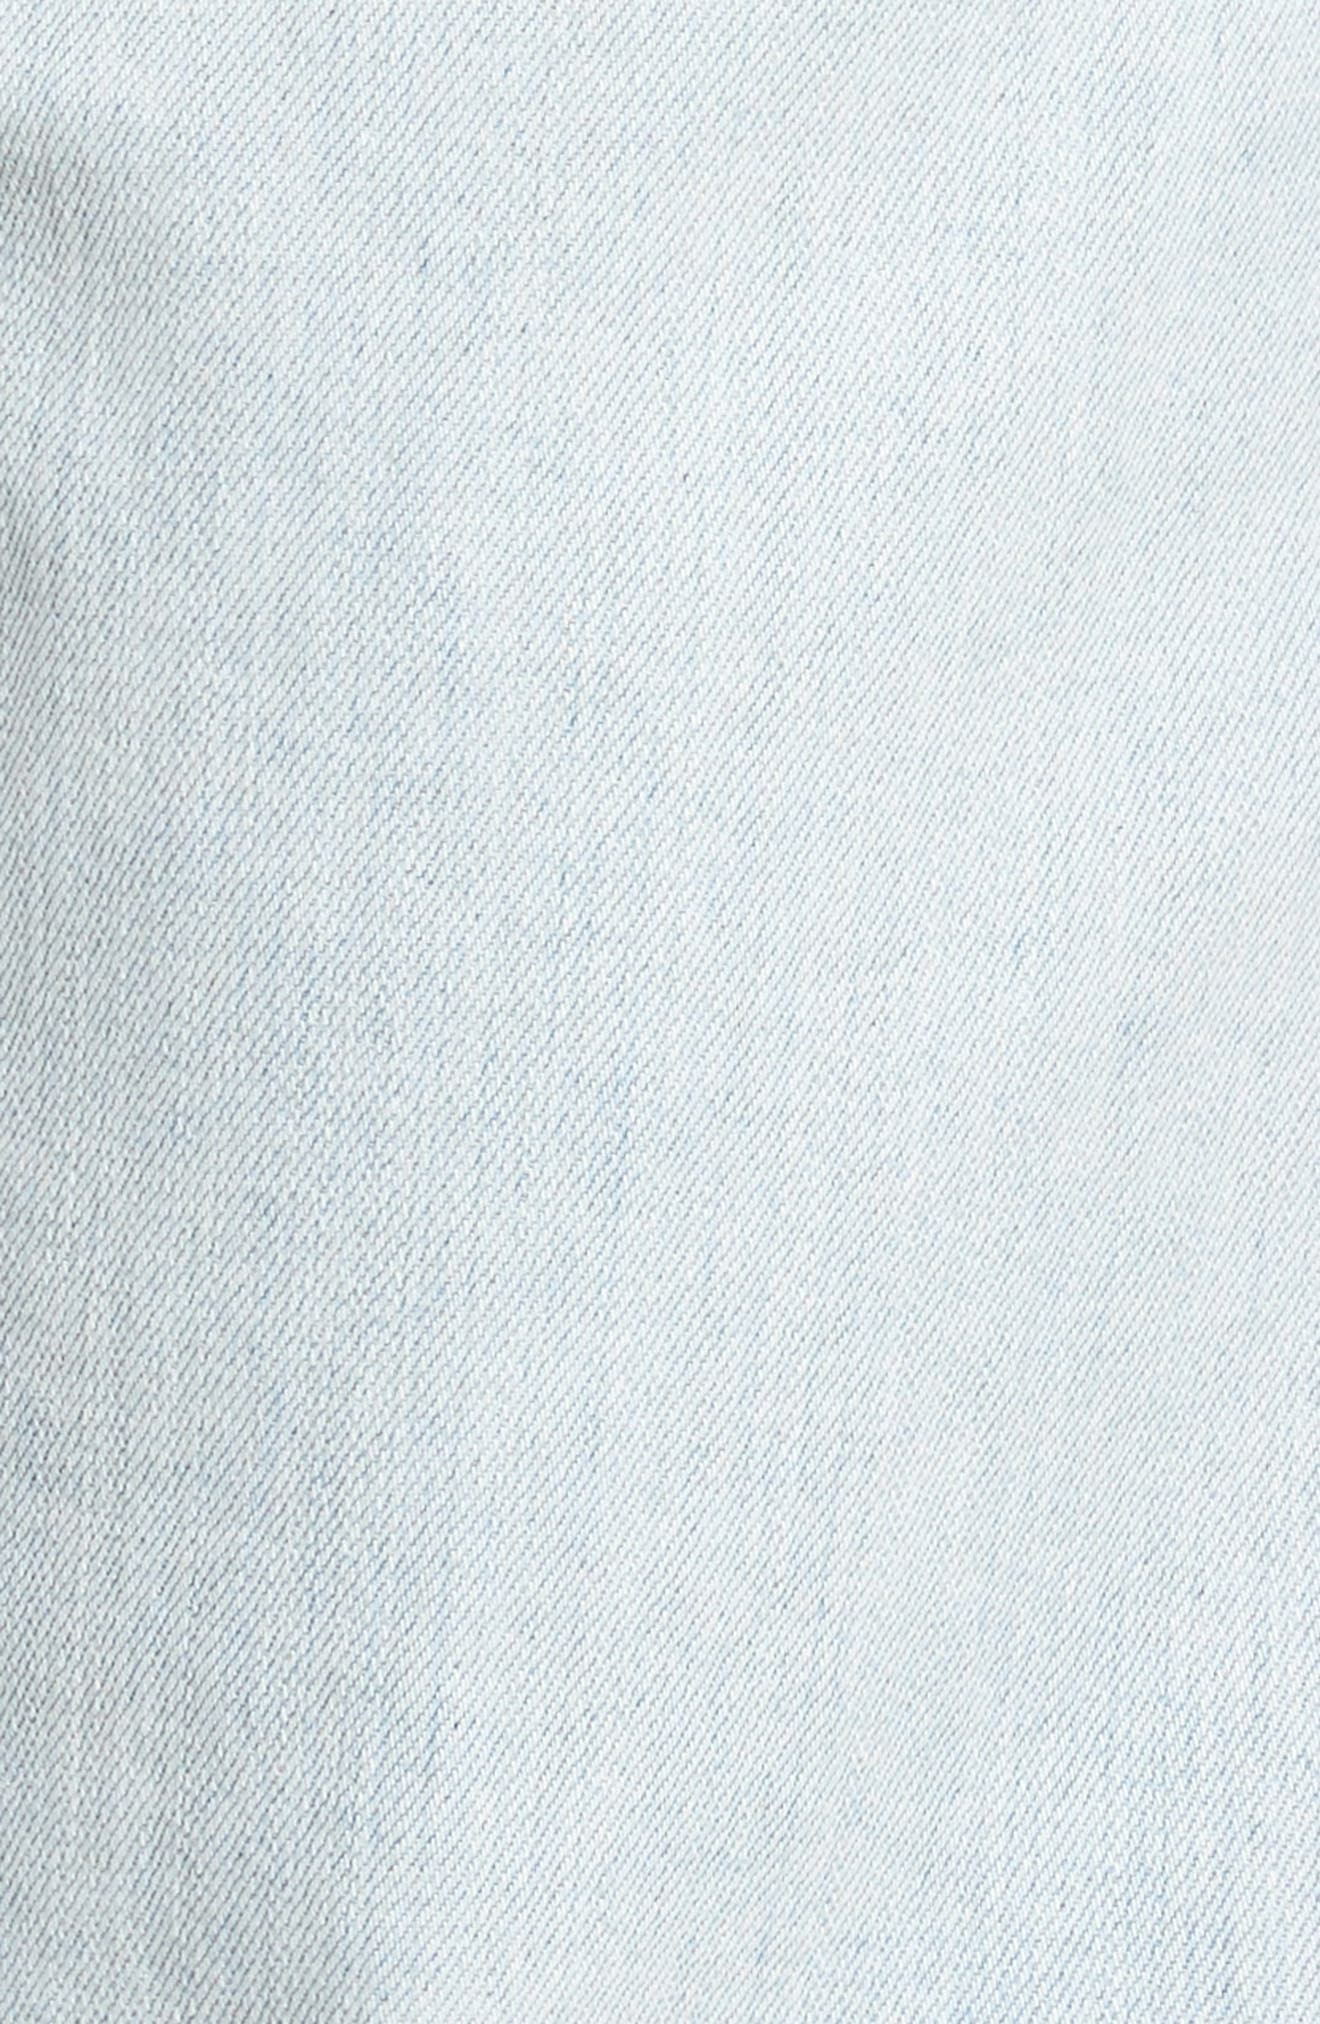 Tellis Slim Fit Jeans,                             Alternate thumbnail 5, color,                             27 Years Surfrider